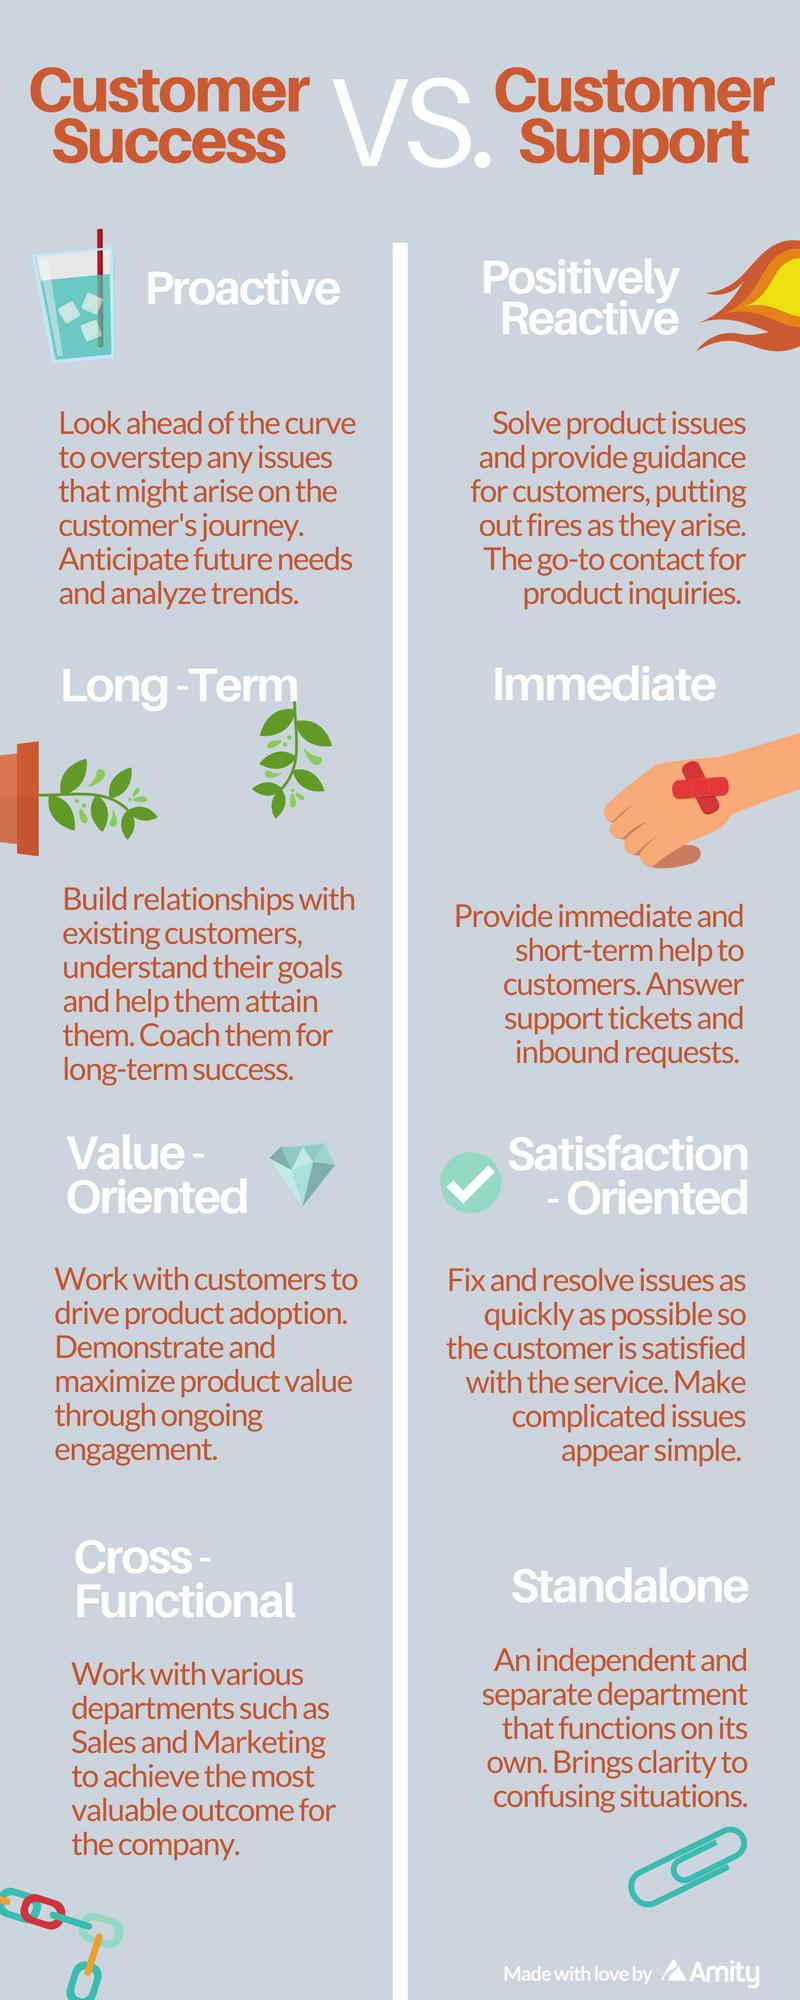 Customer Success vs. Customer Support [Infographic]